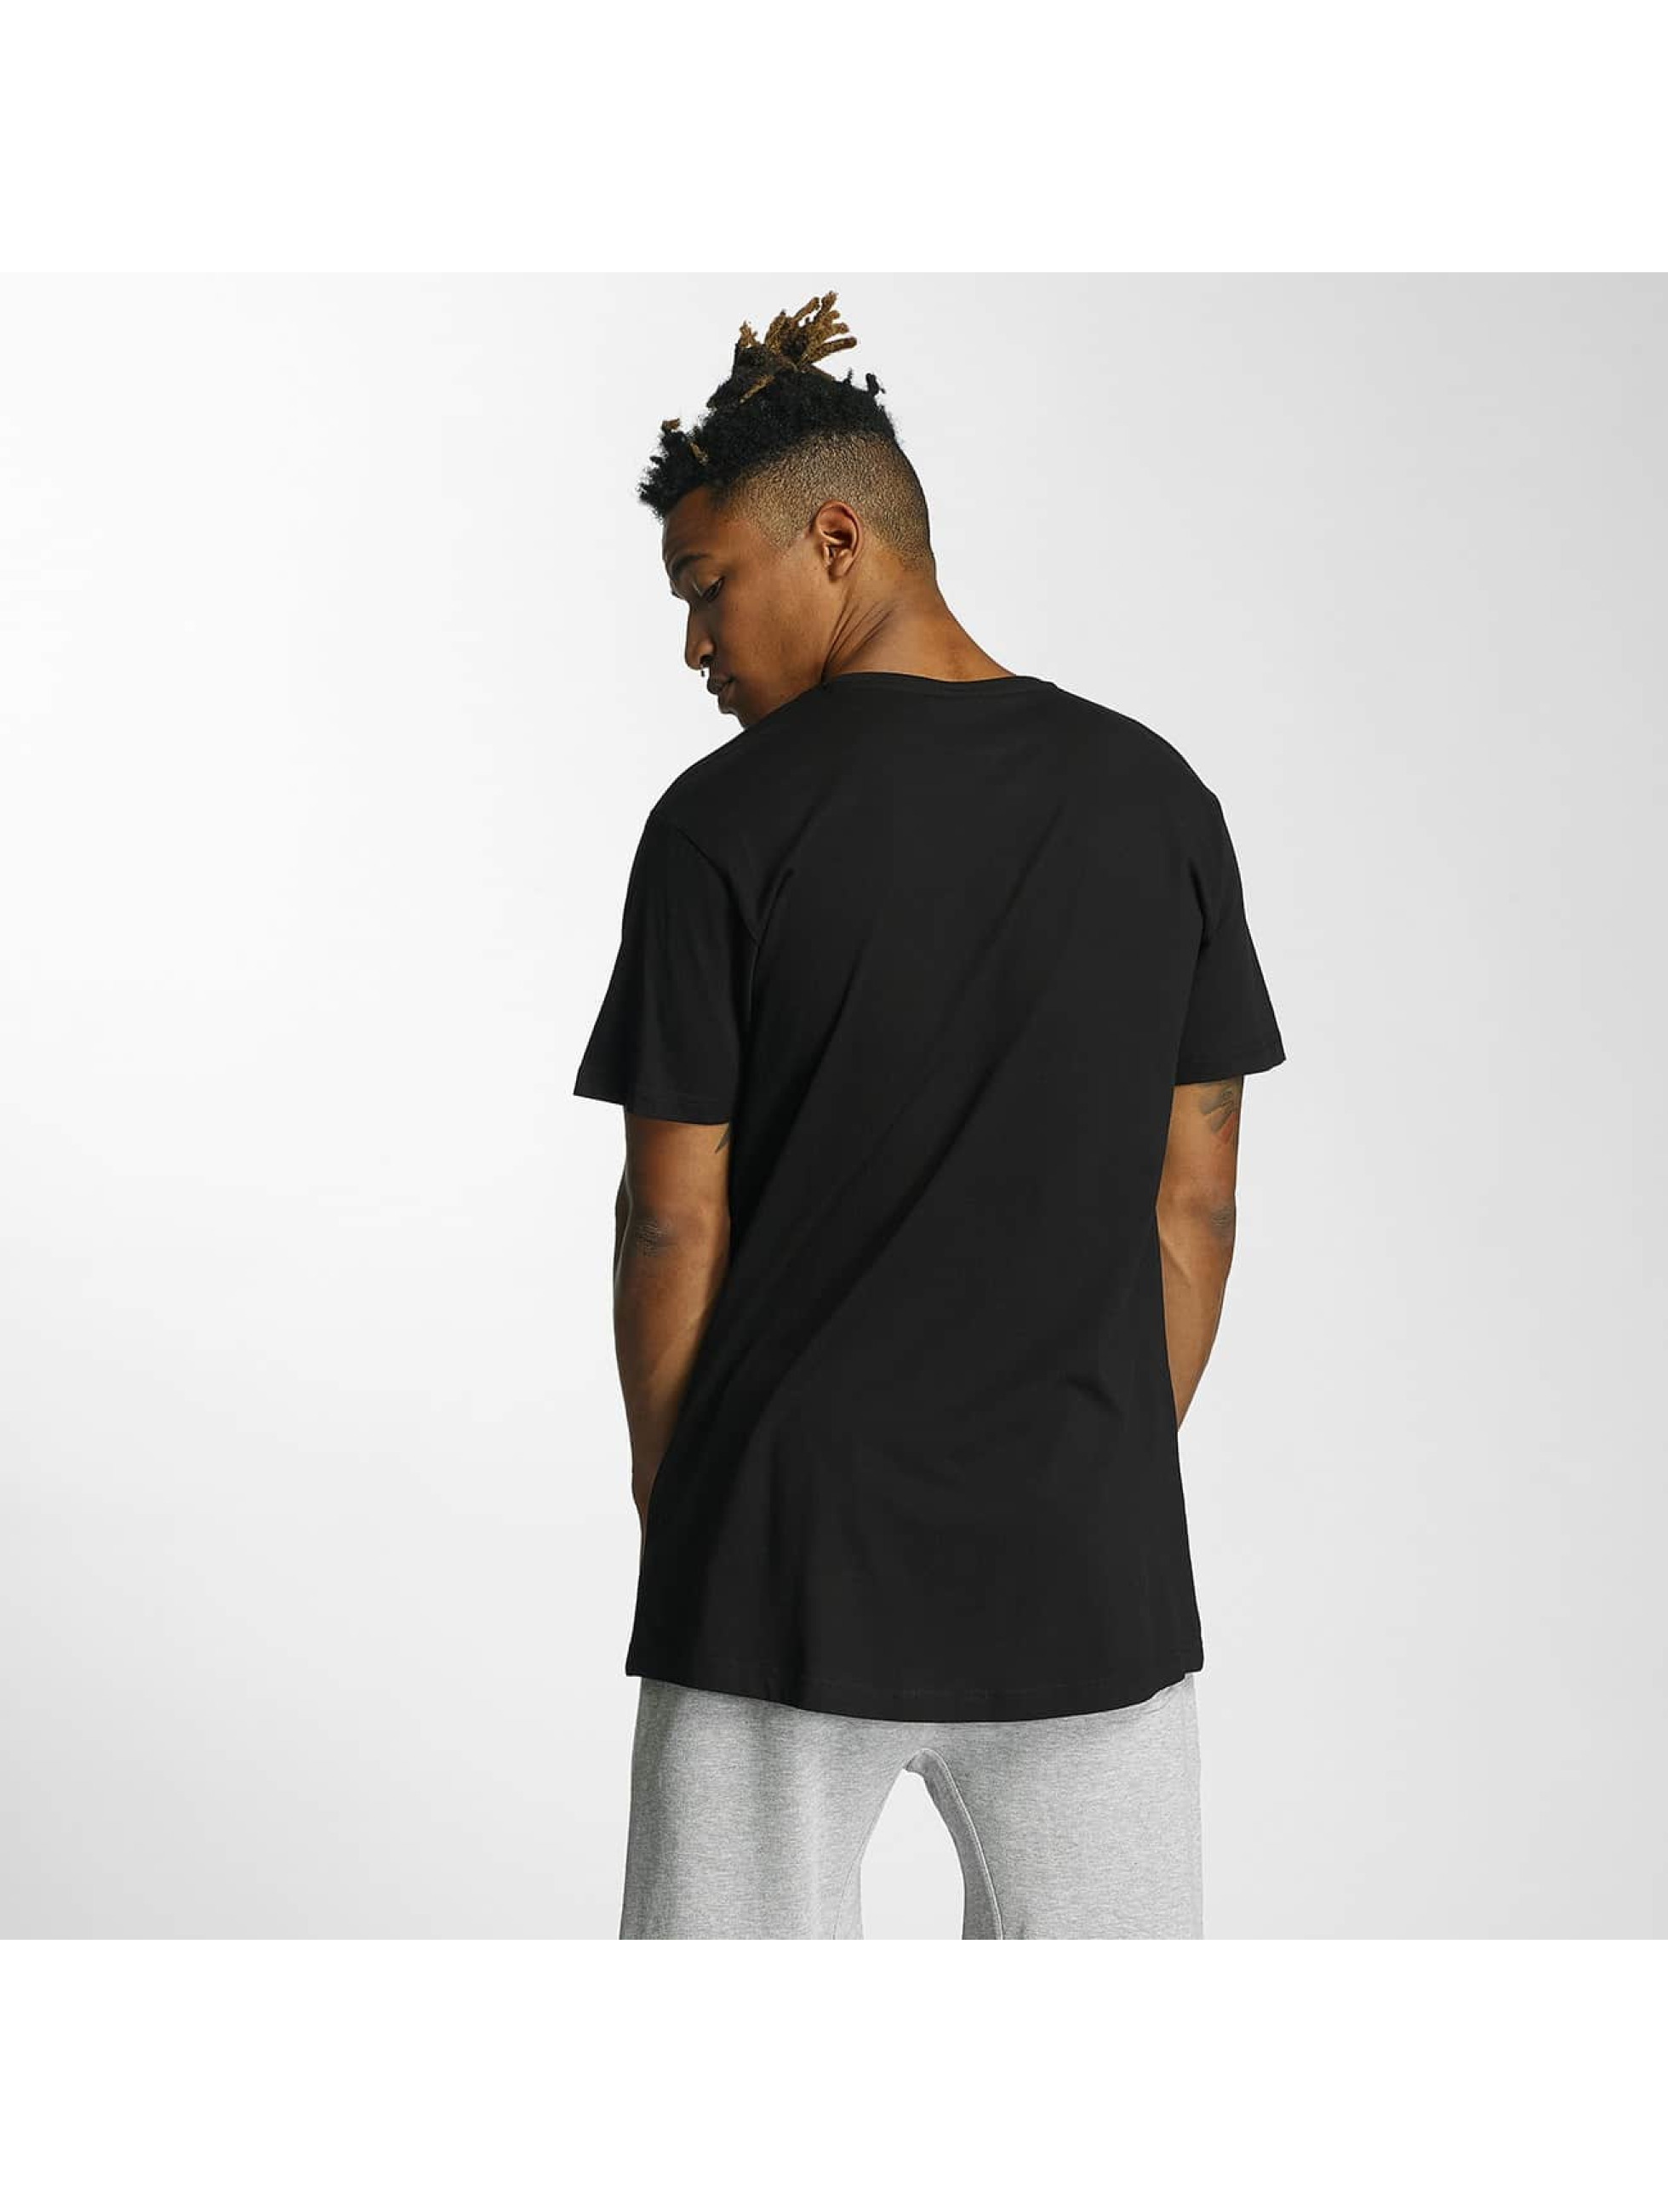 Kingin T-Shirt Pharao schwarz